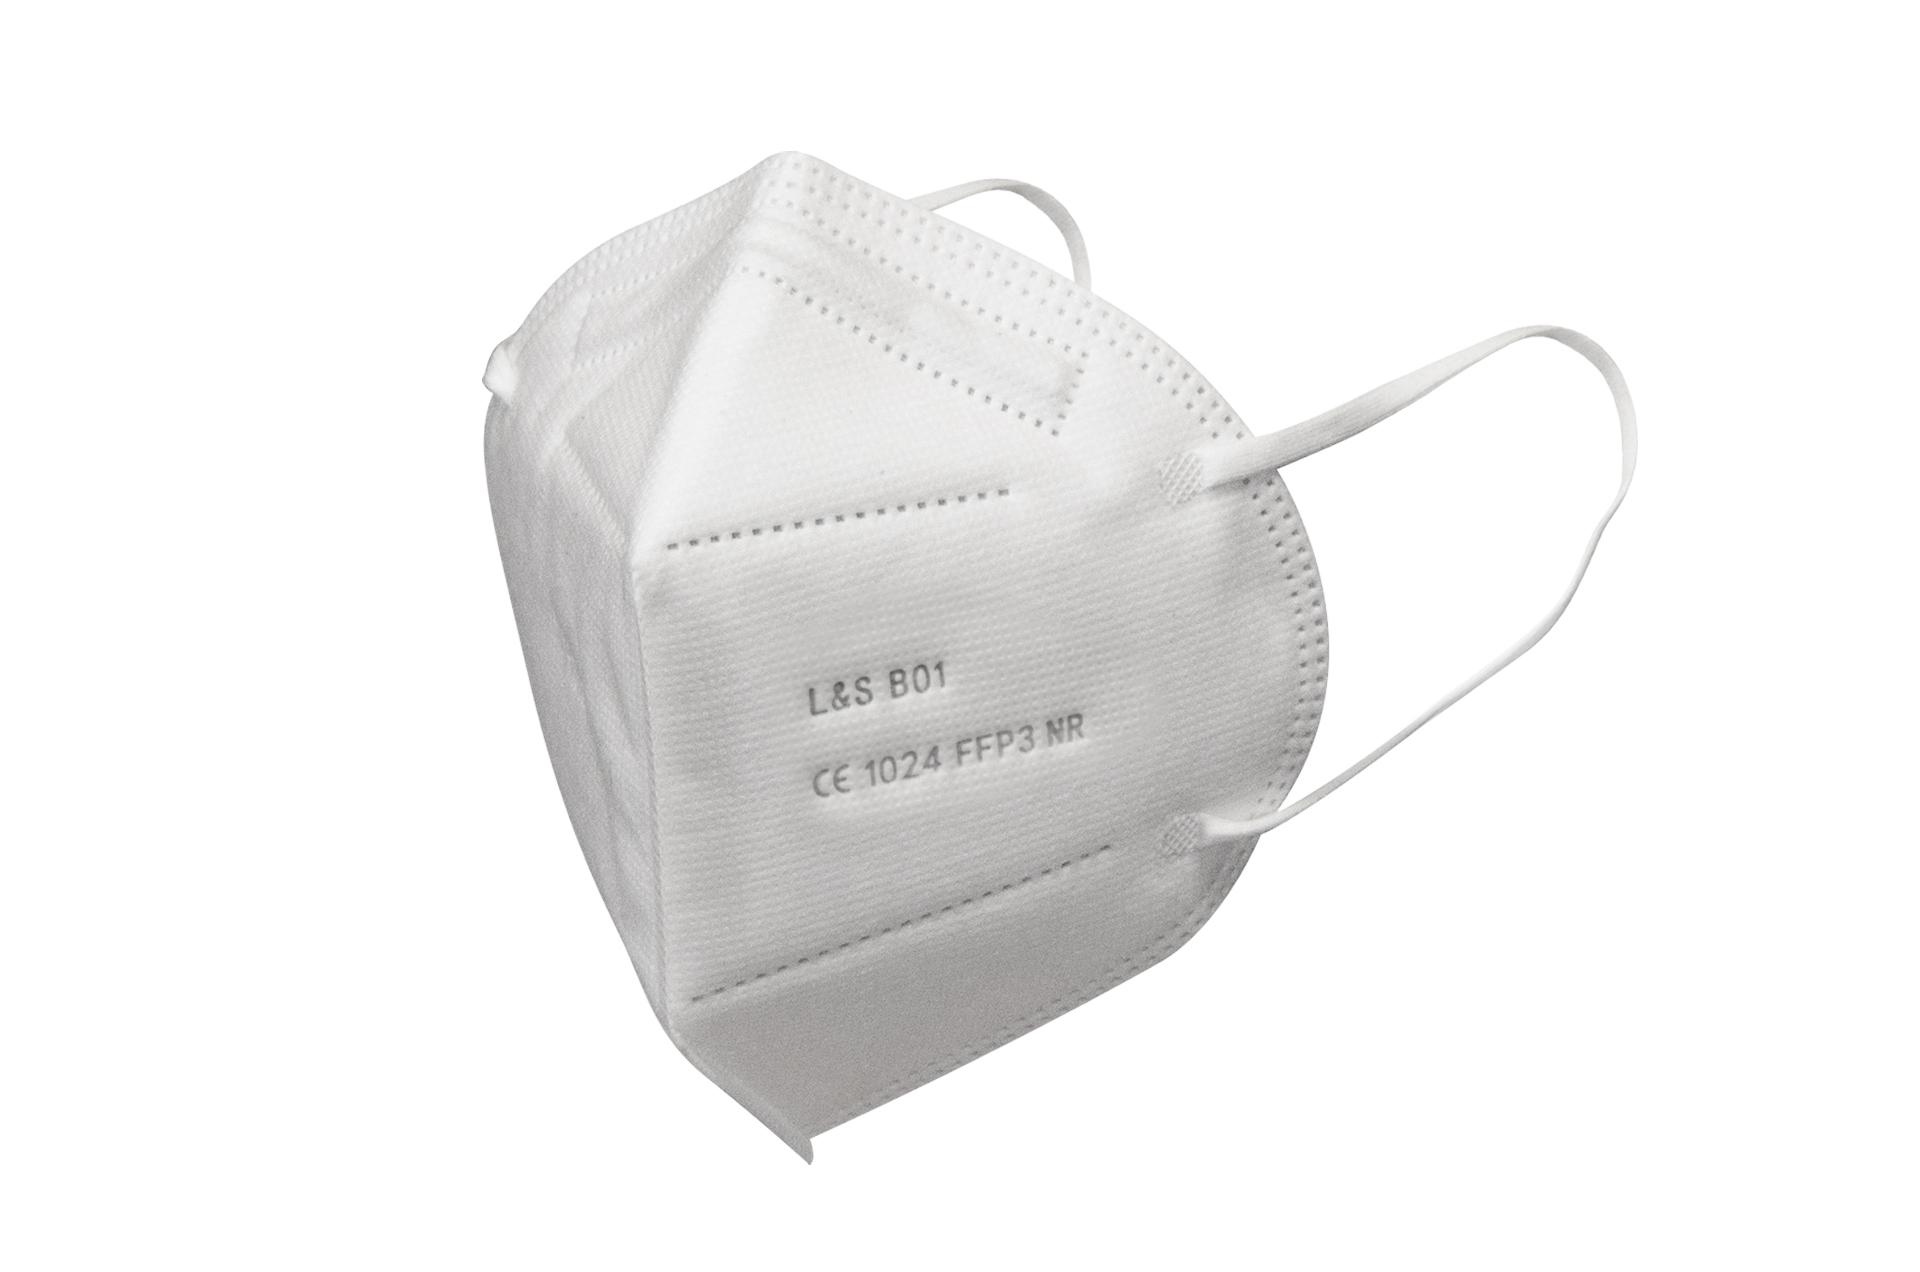 Respirátor FFP3 NR L&S B01 - 5 vrstev - 99,87% účinnost /5ks/